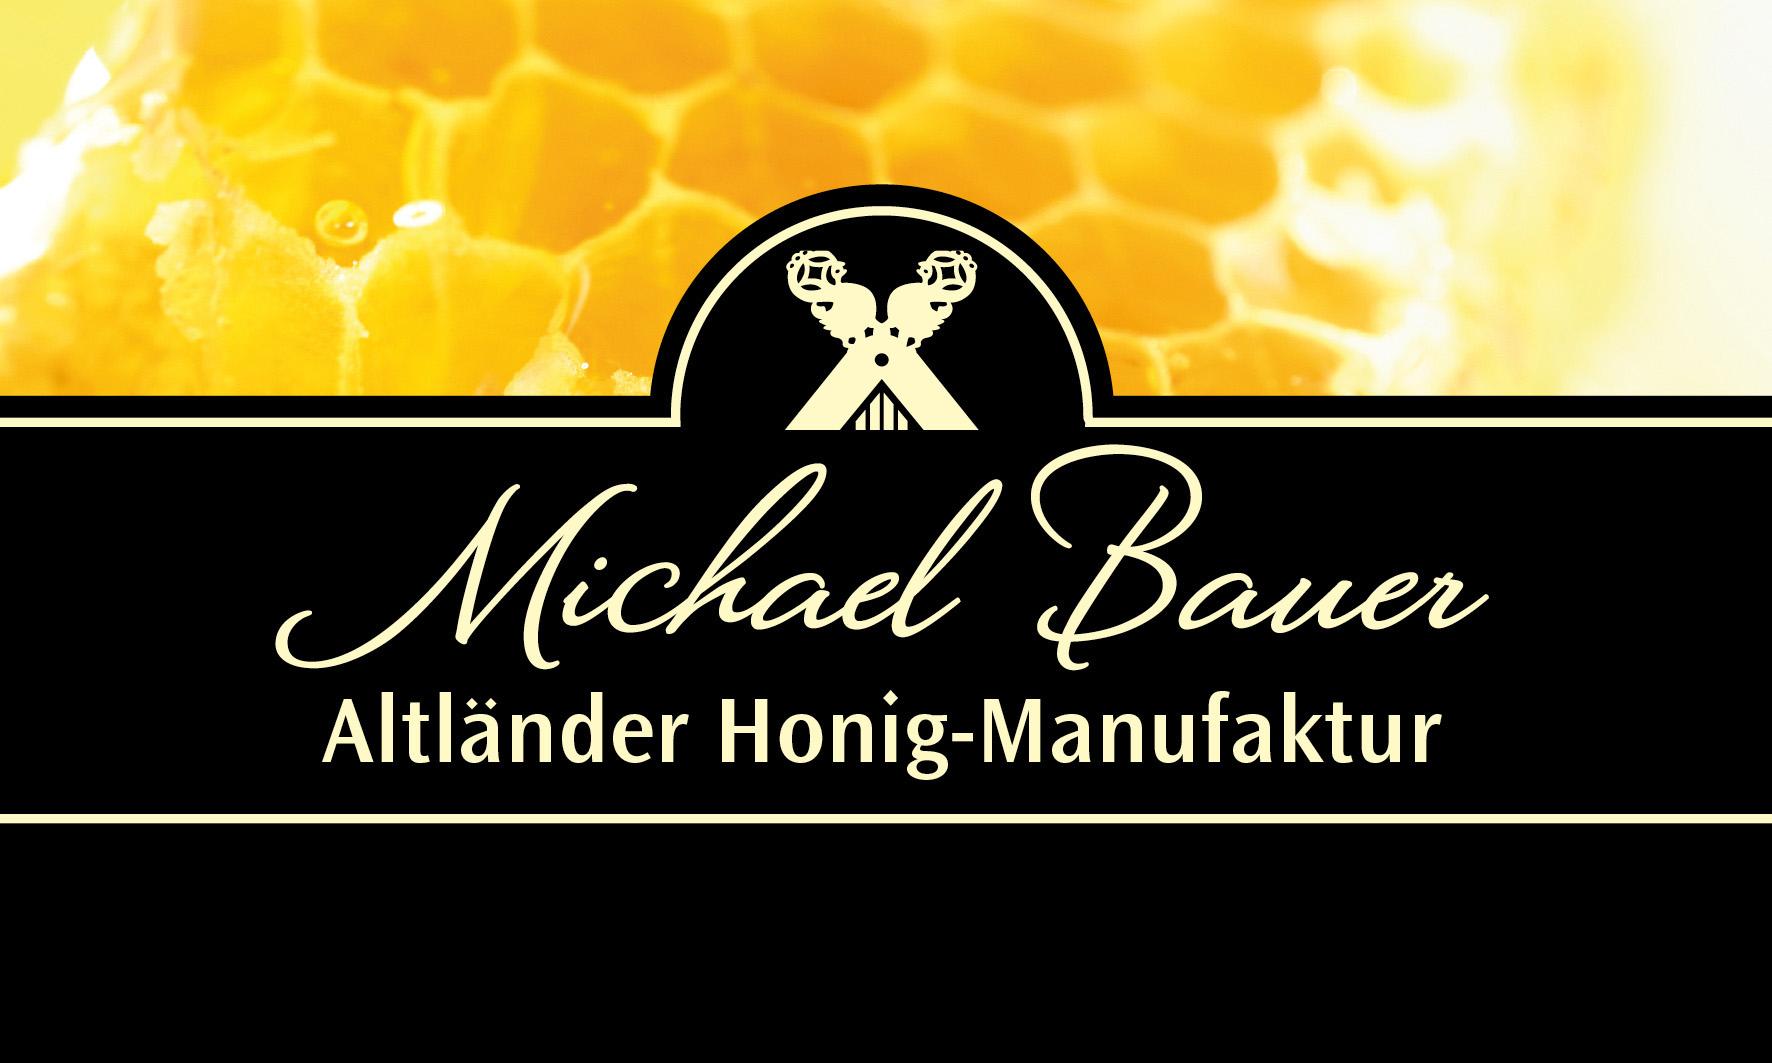 Honigmanufaktur Michael Bauer